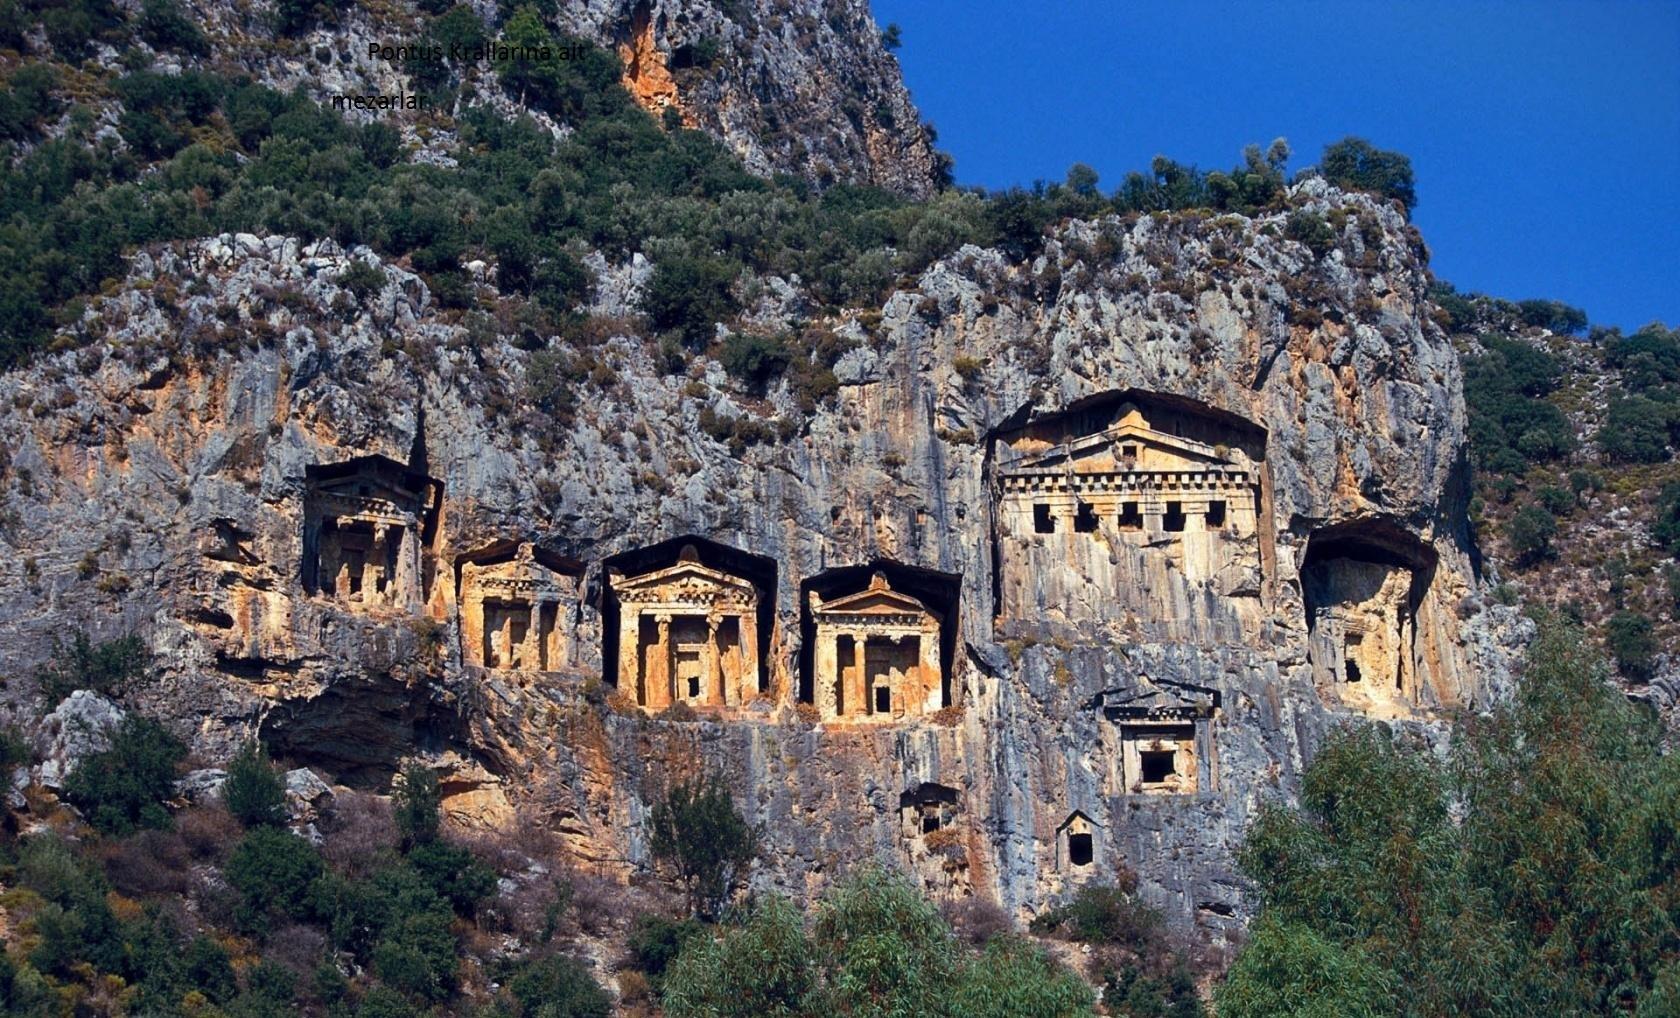 7 Amazing Houses Built Into Nature: اليونسكو تدرج 10 مناطق في تركيا إلى قائمة مواقع التراث